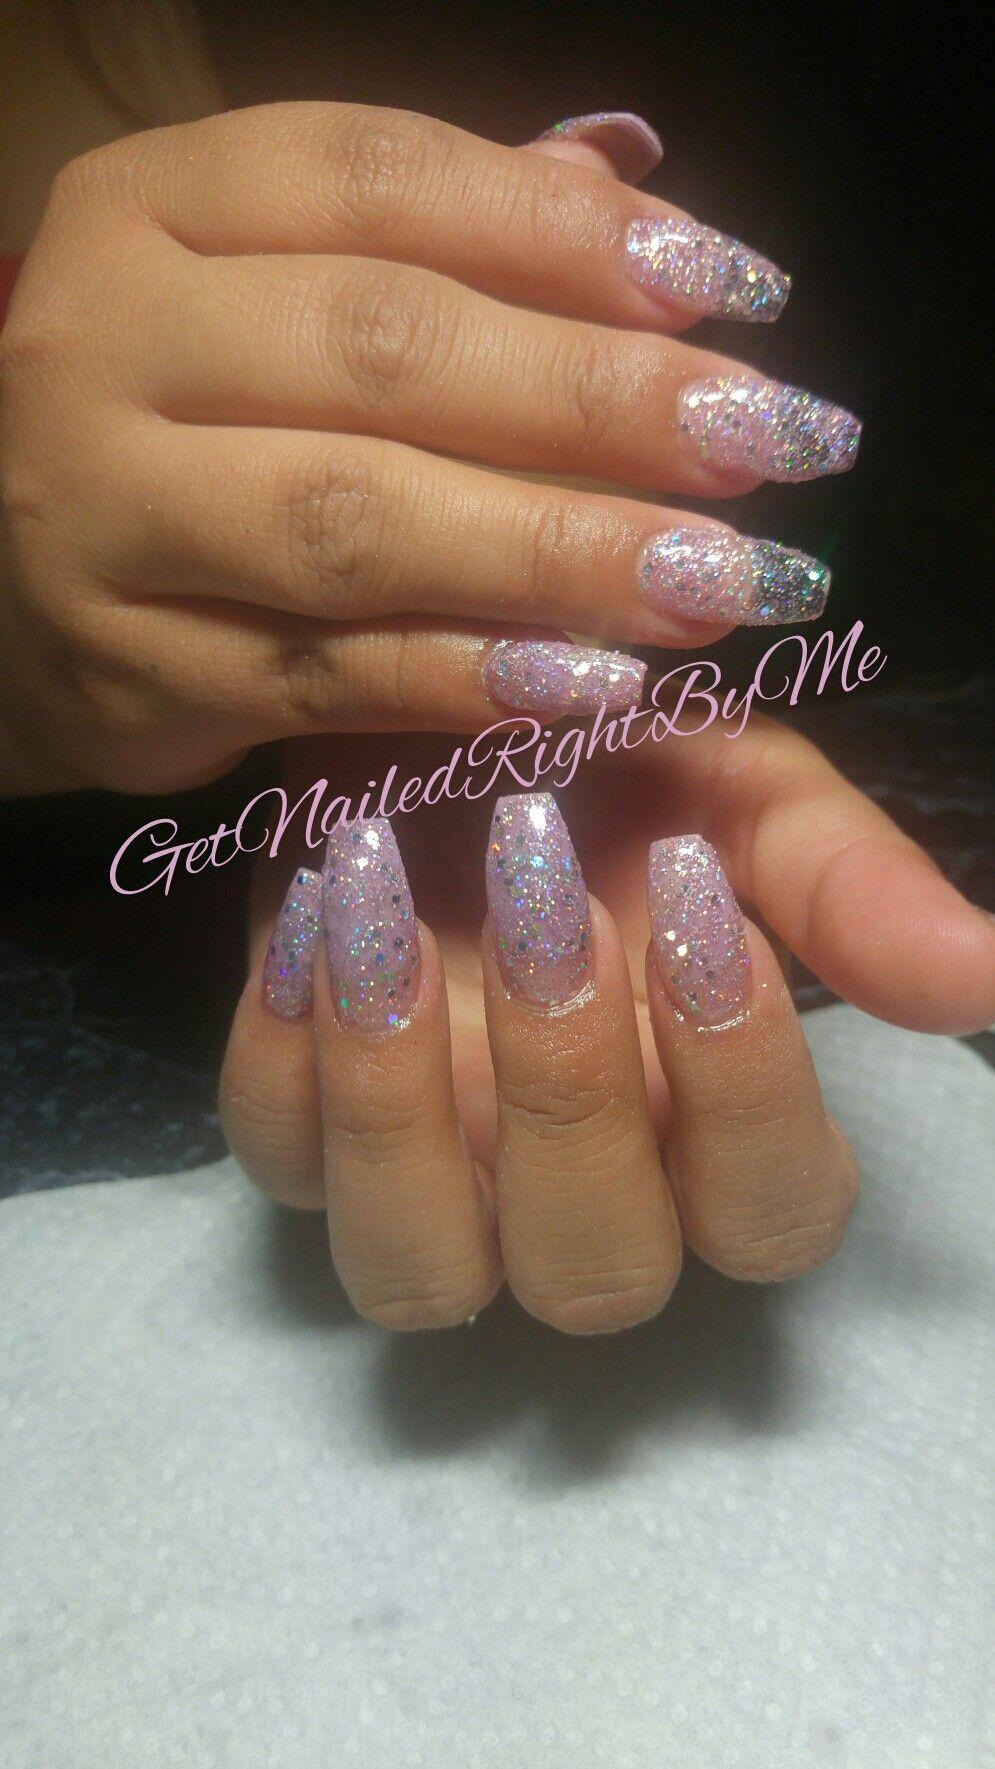 NOTD #Perfection #Flawless #noPolish #pretty #fresno #nails ...